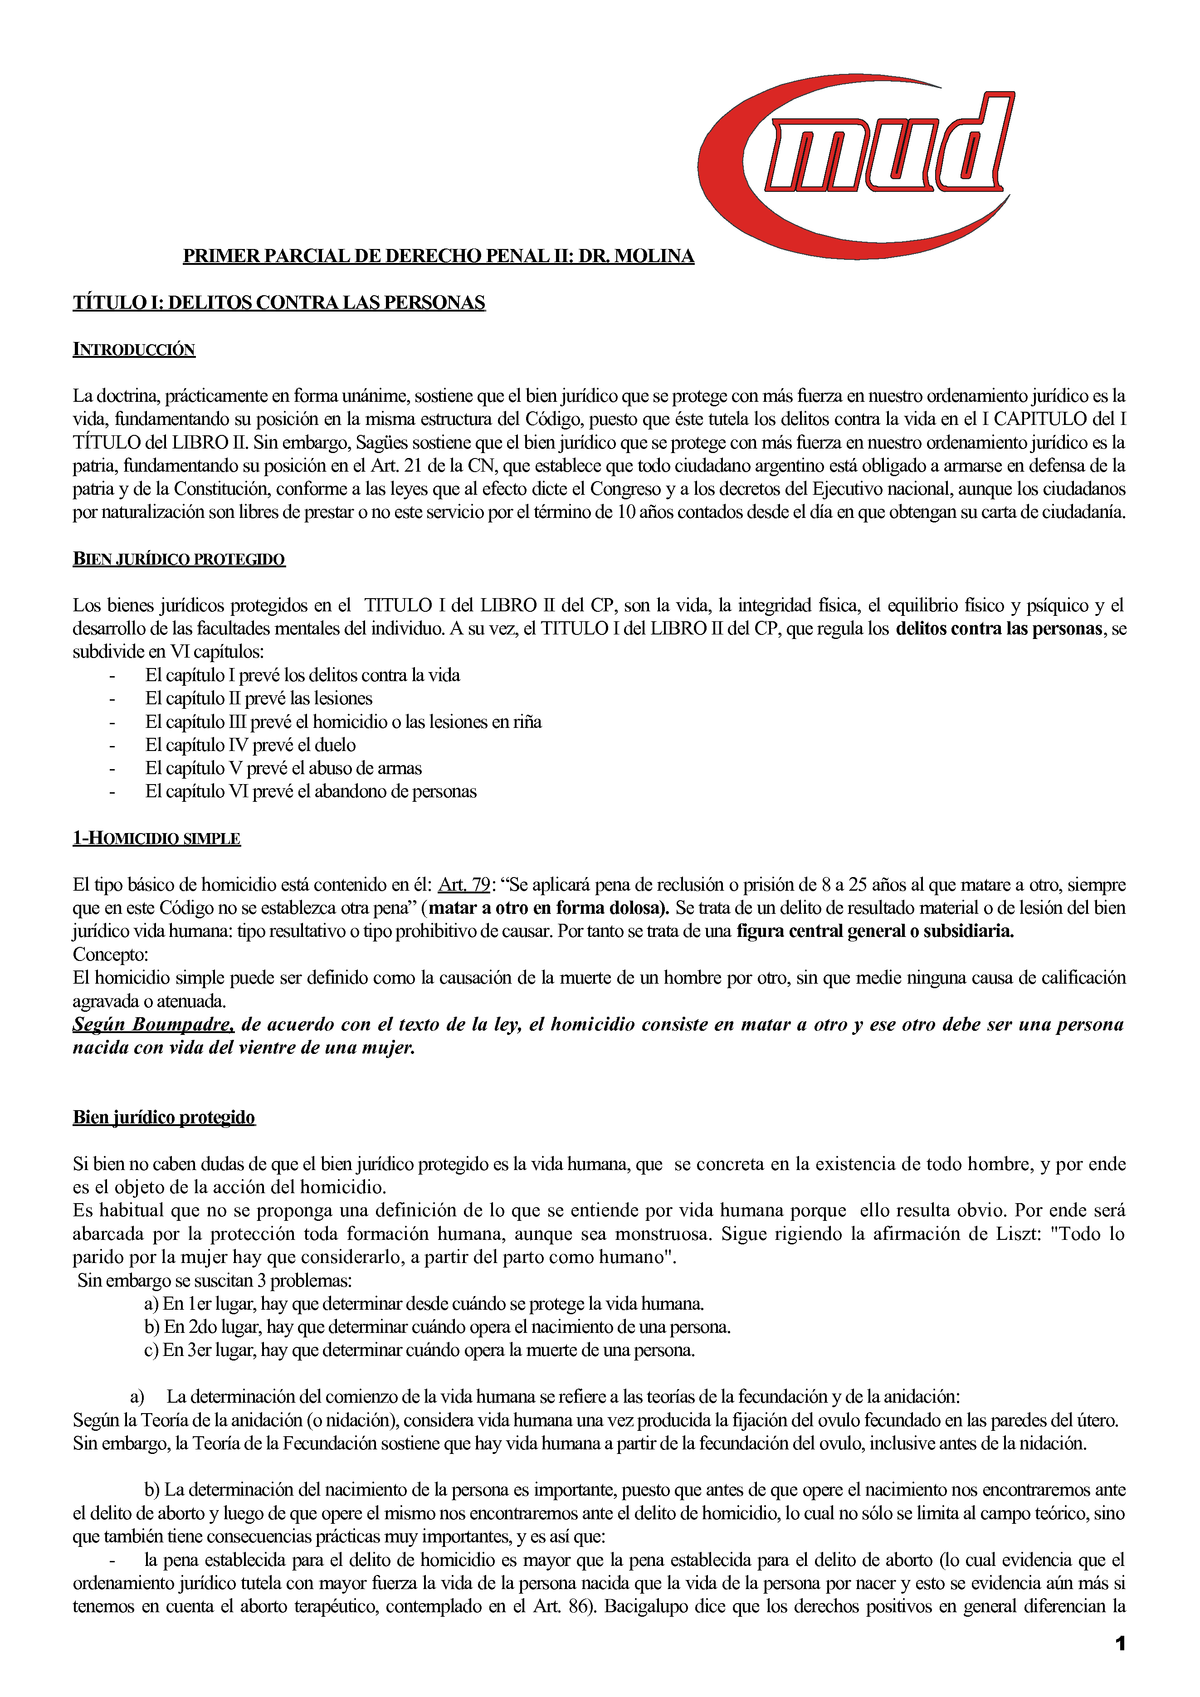 Apunte penal 2 - Dr  molina - Derecho Civil Iii - UNNE - StuDocu